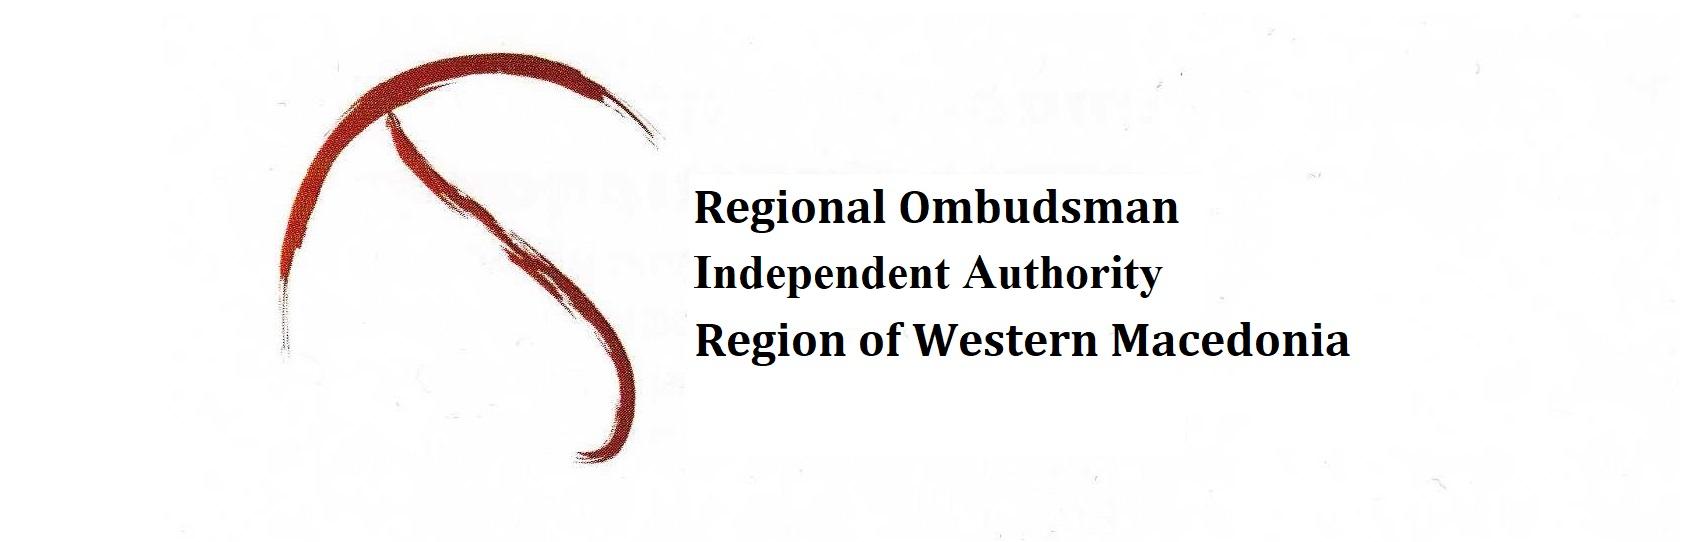 Regional Ombudsman